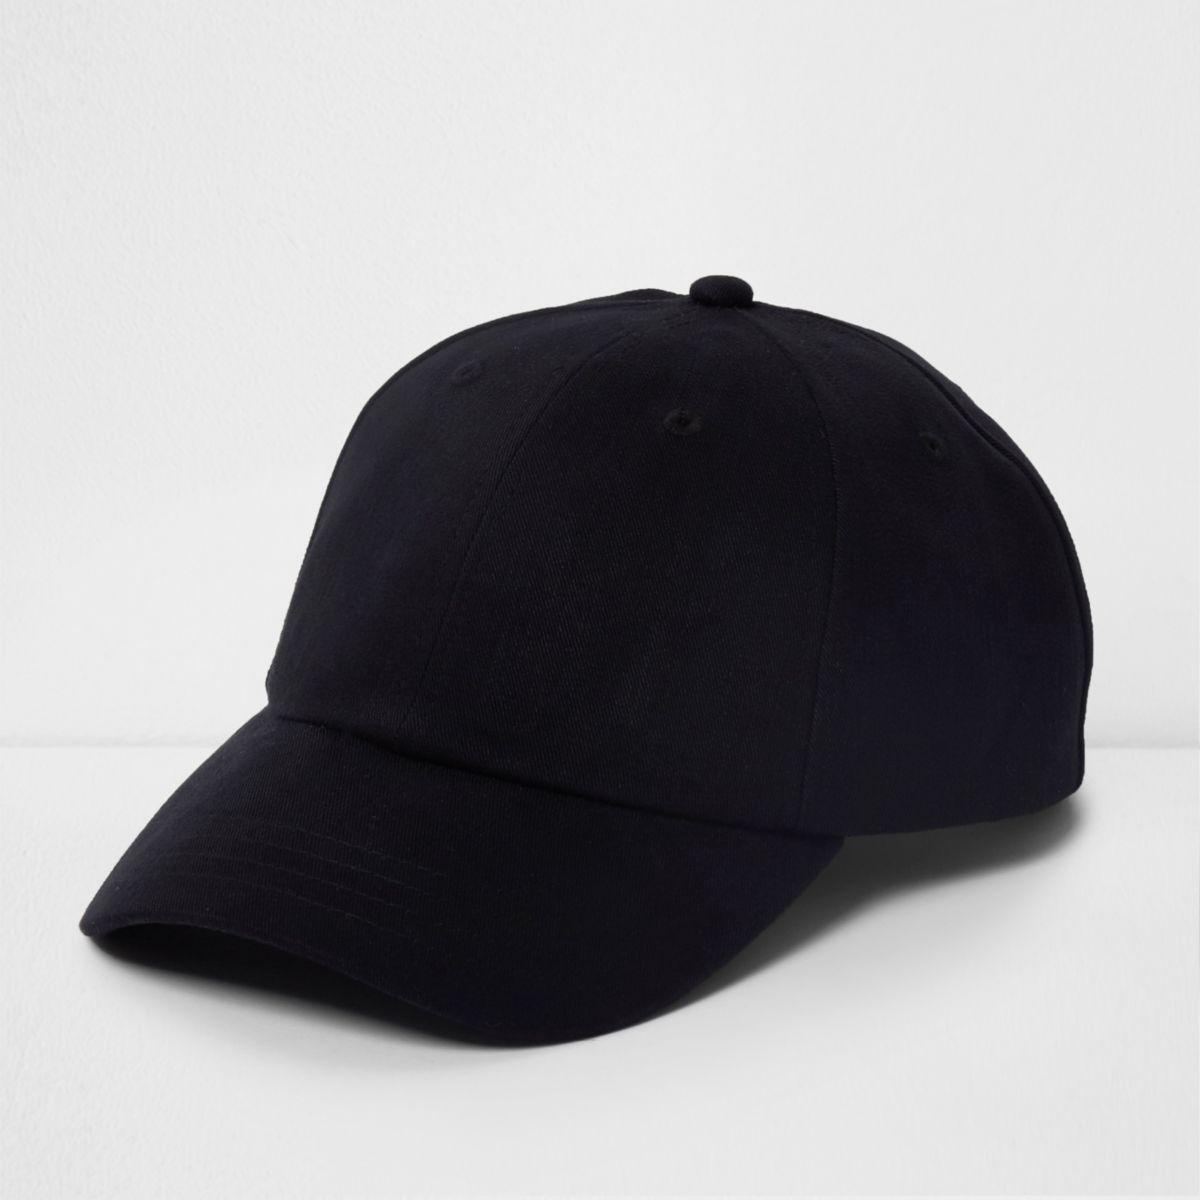 Black soft twill baseball cap